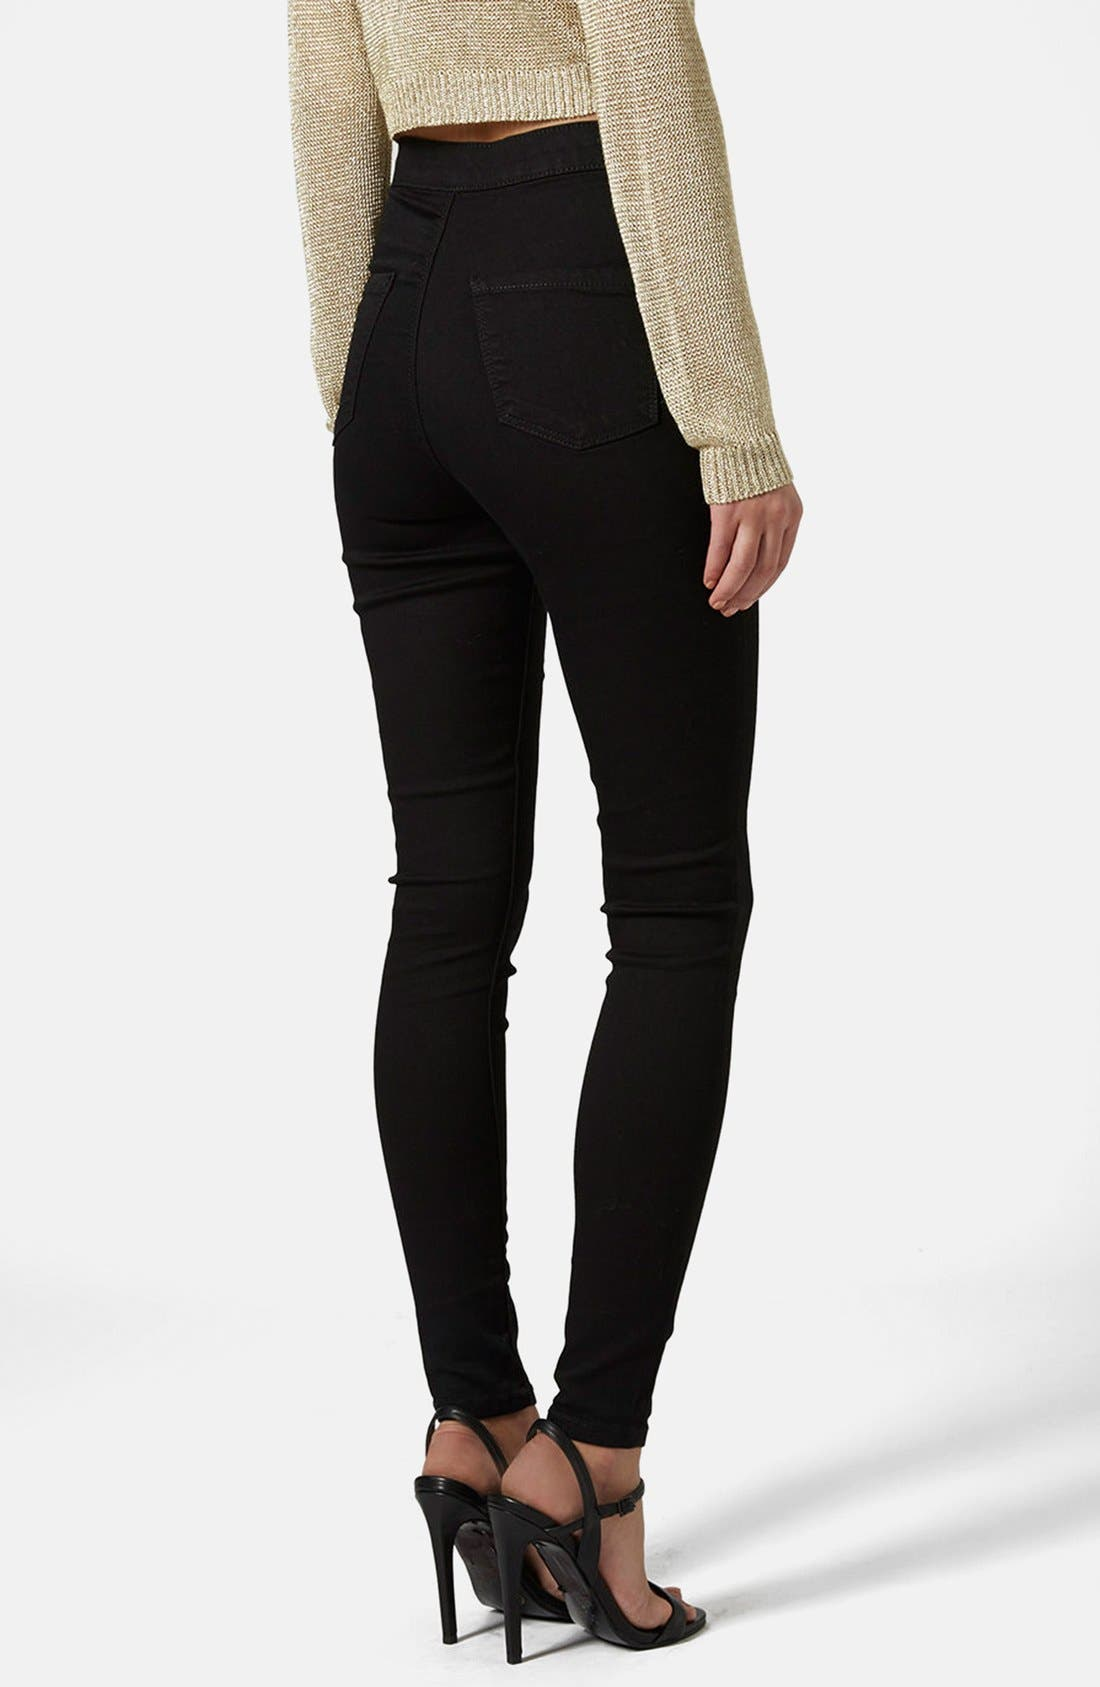 TOPSHOP, Joni High Waist Ankle Skinny Jeans, Alternate thumbnail 5, color, 001